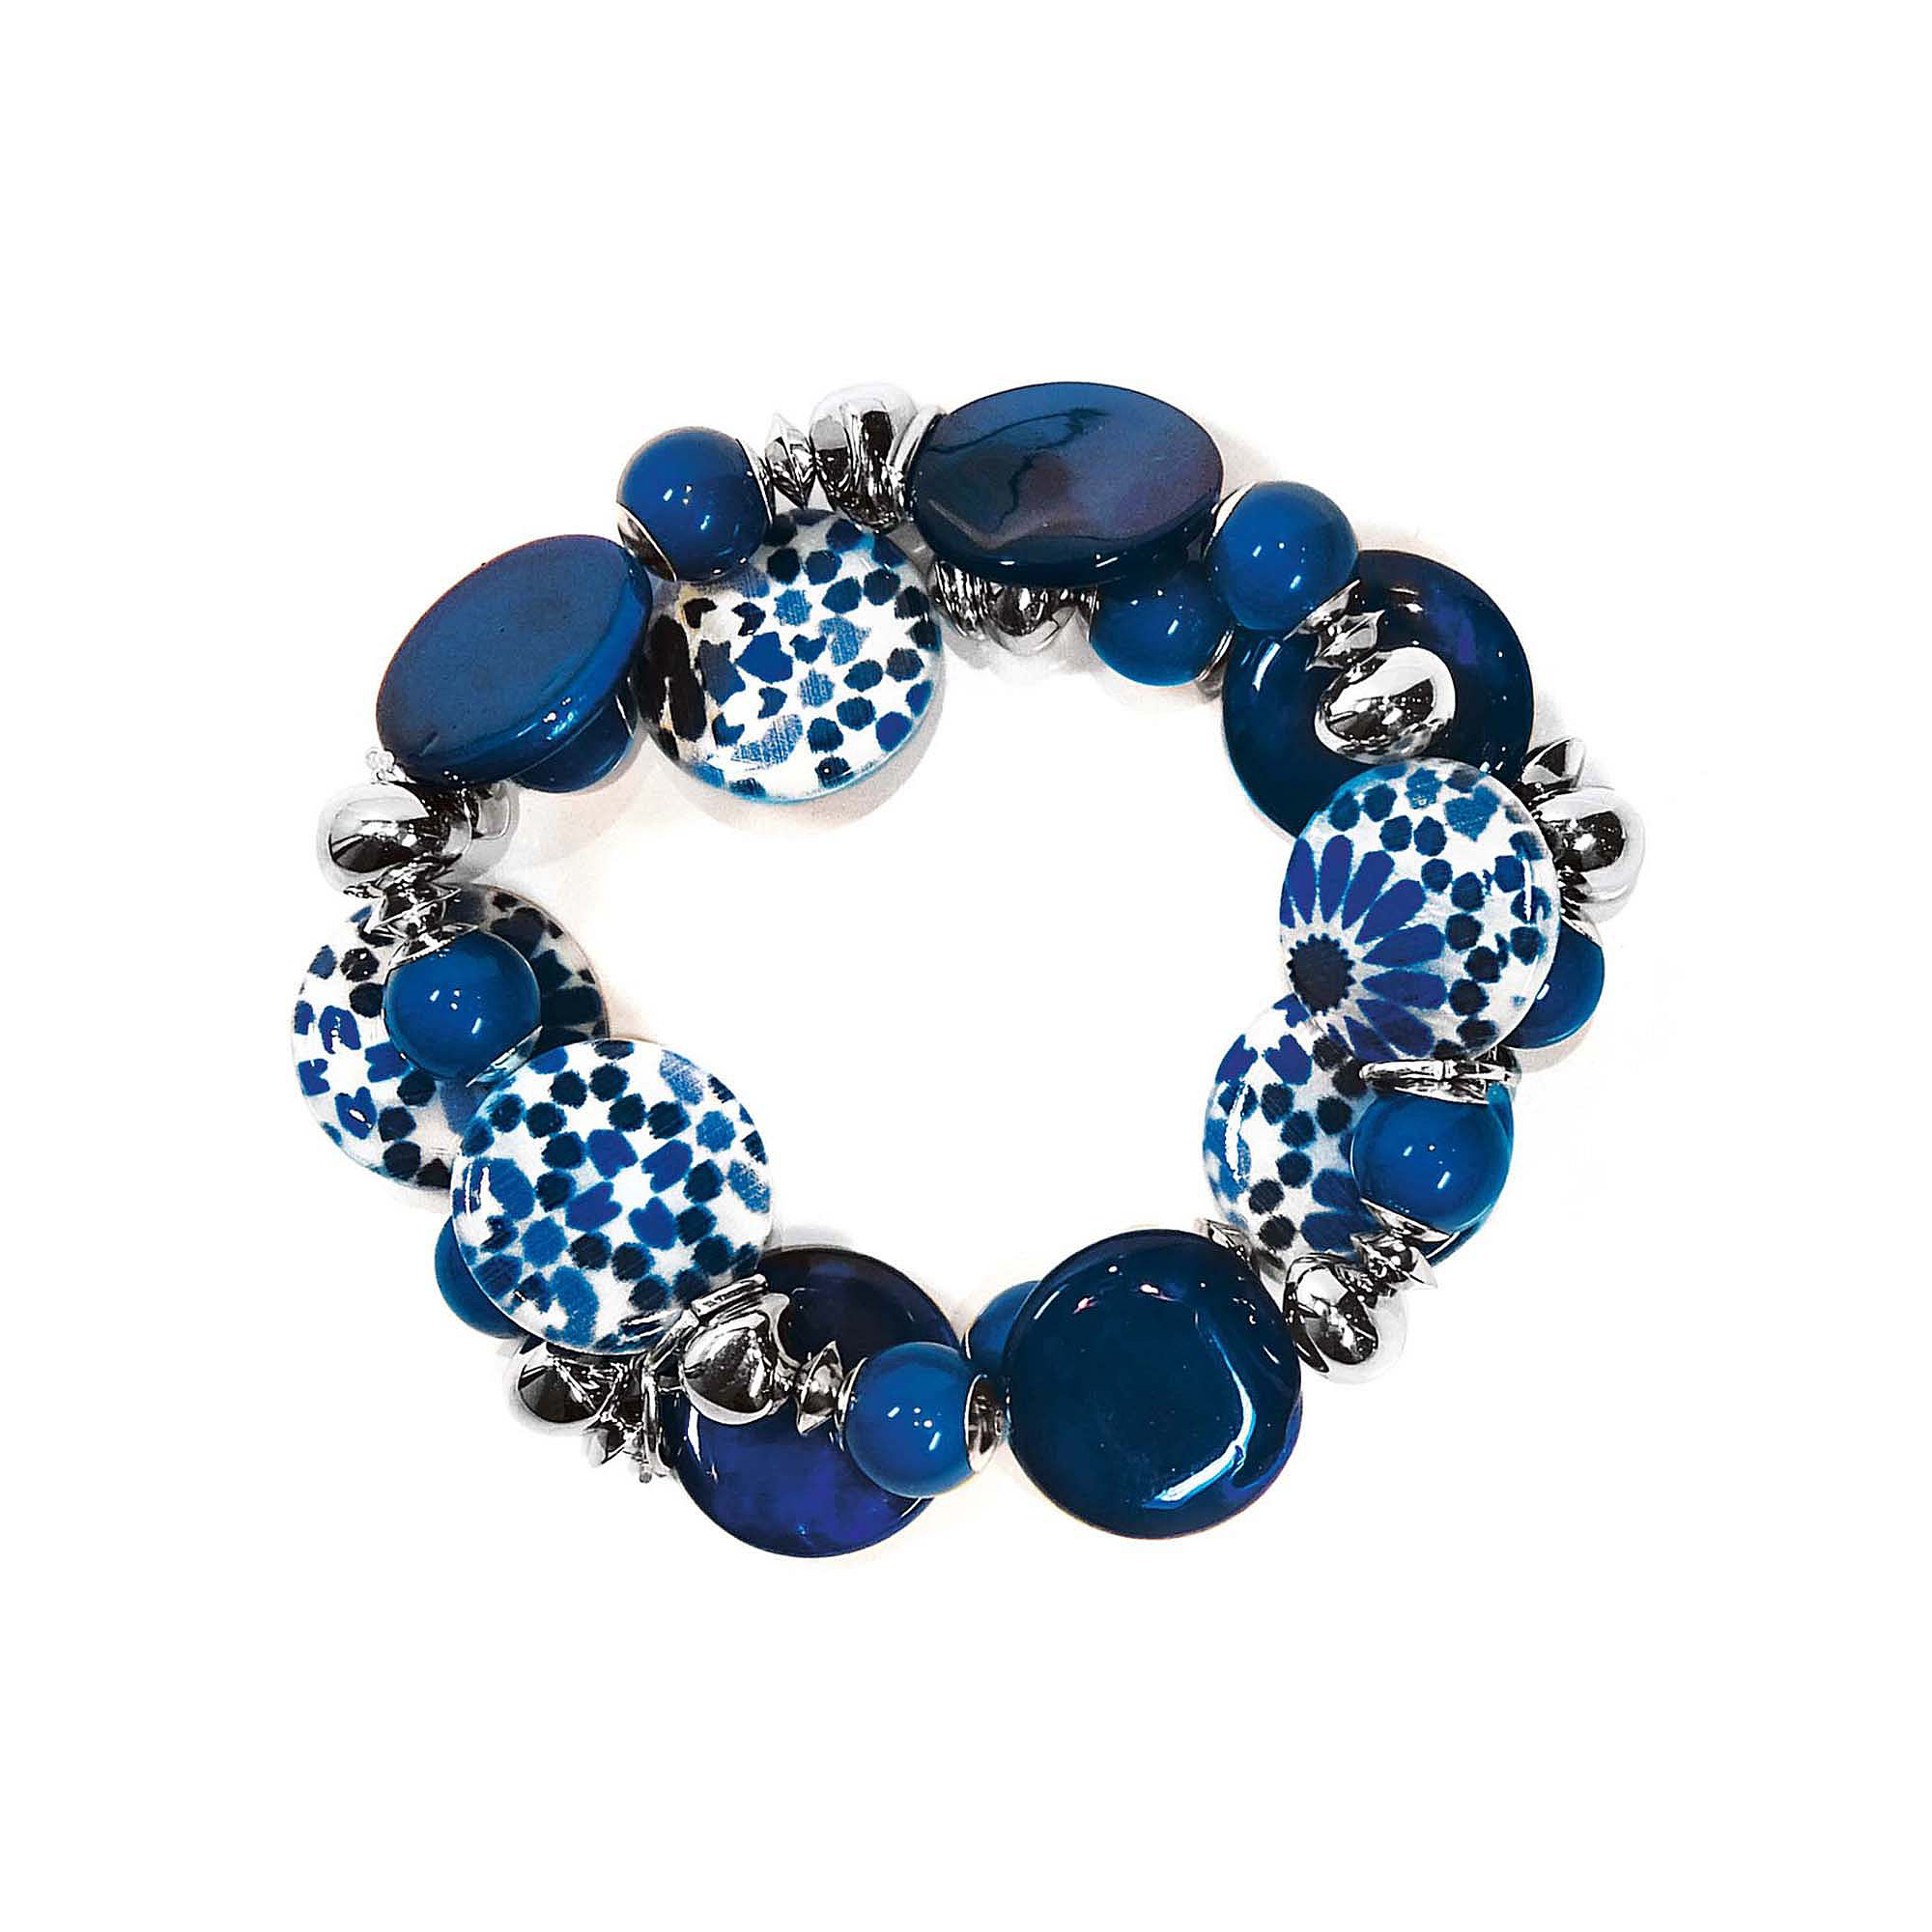 Studio By Carol Dauplaise Silver-Tone Blue 2-Row Stretch Bracelet